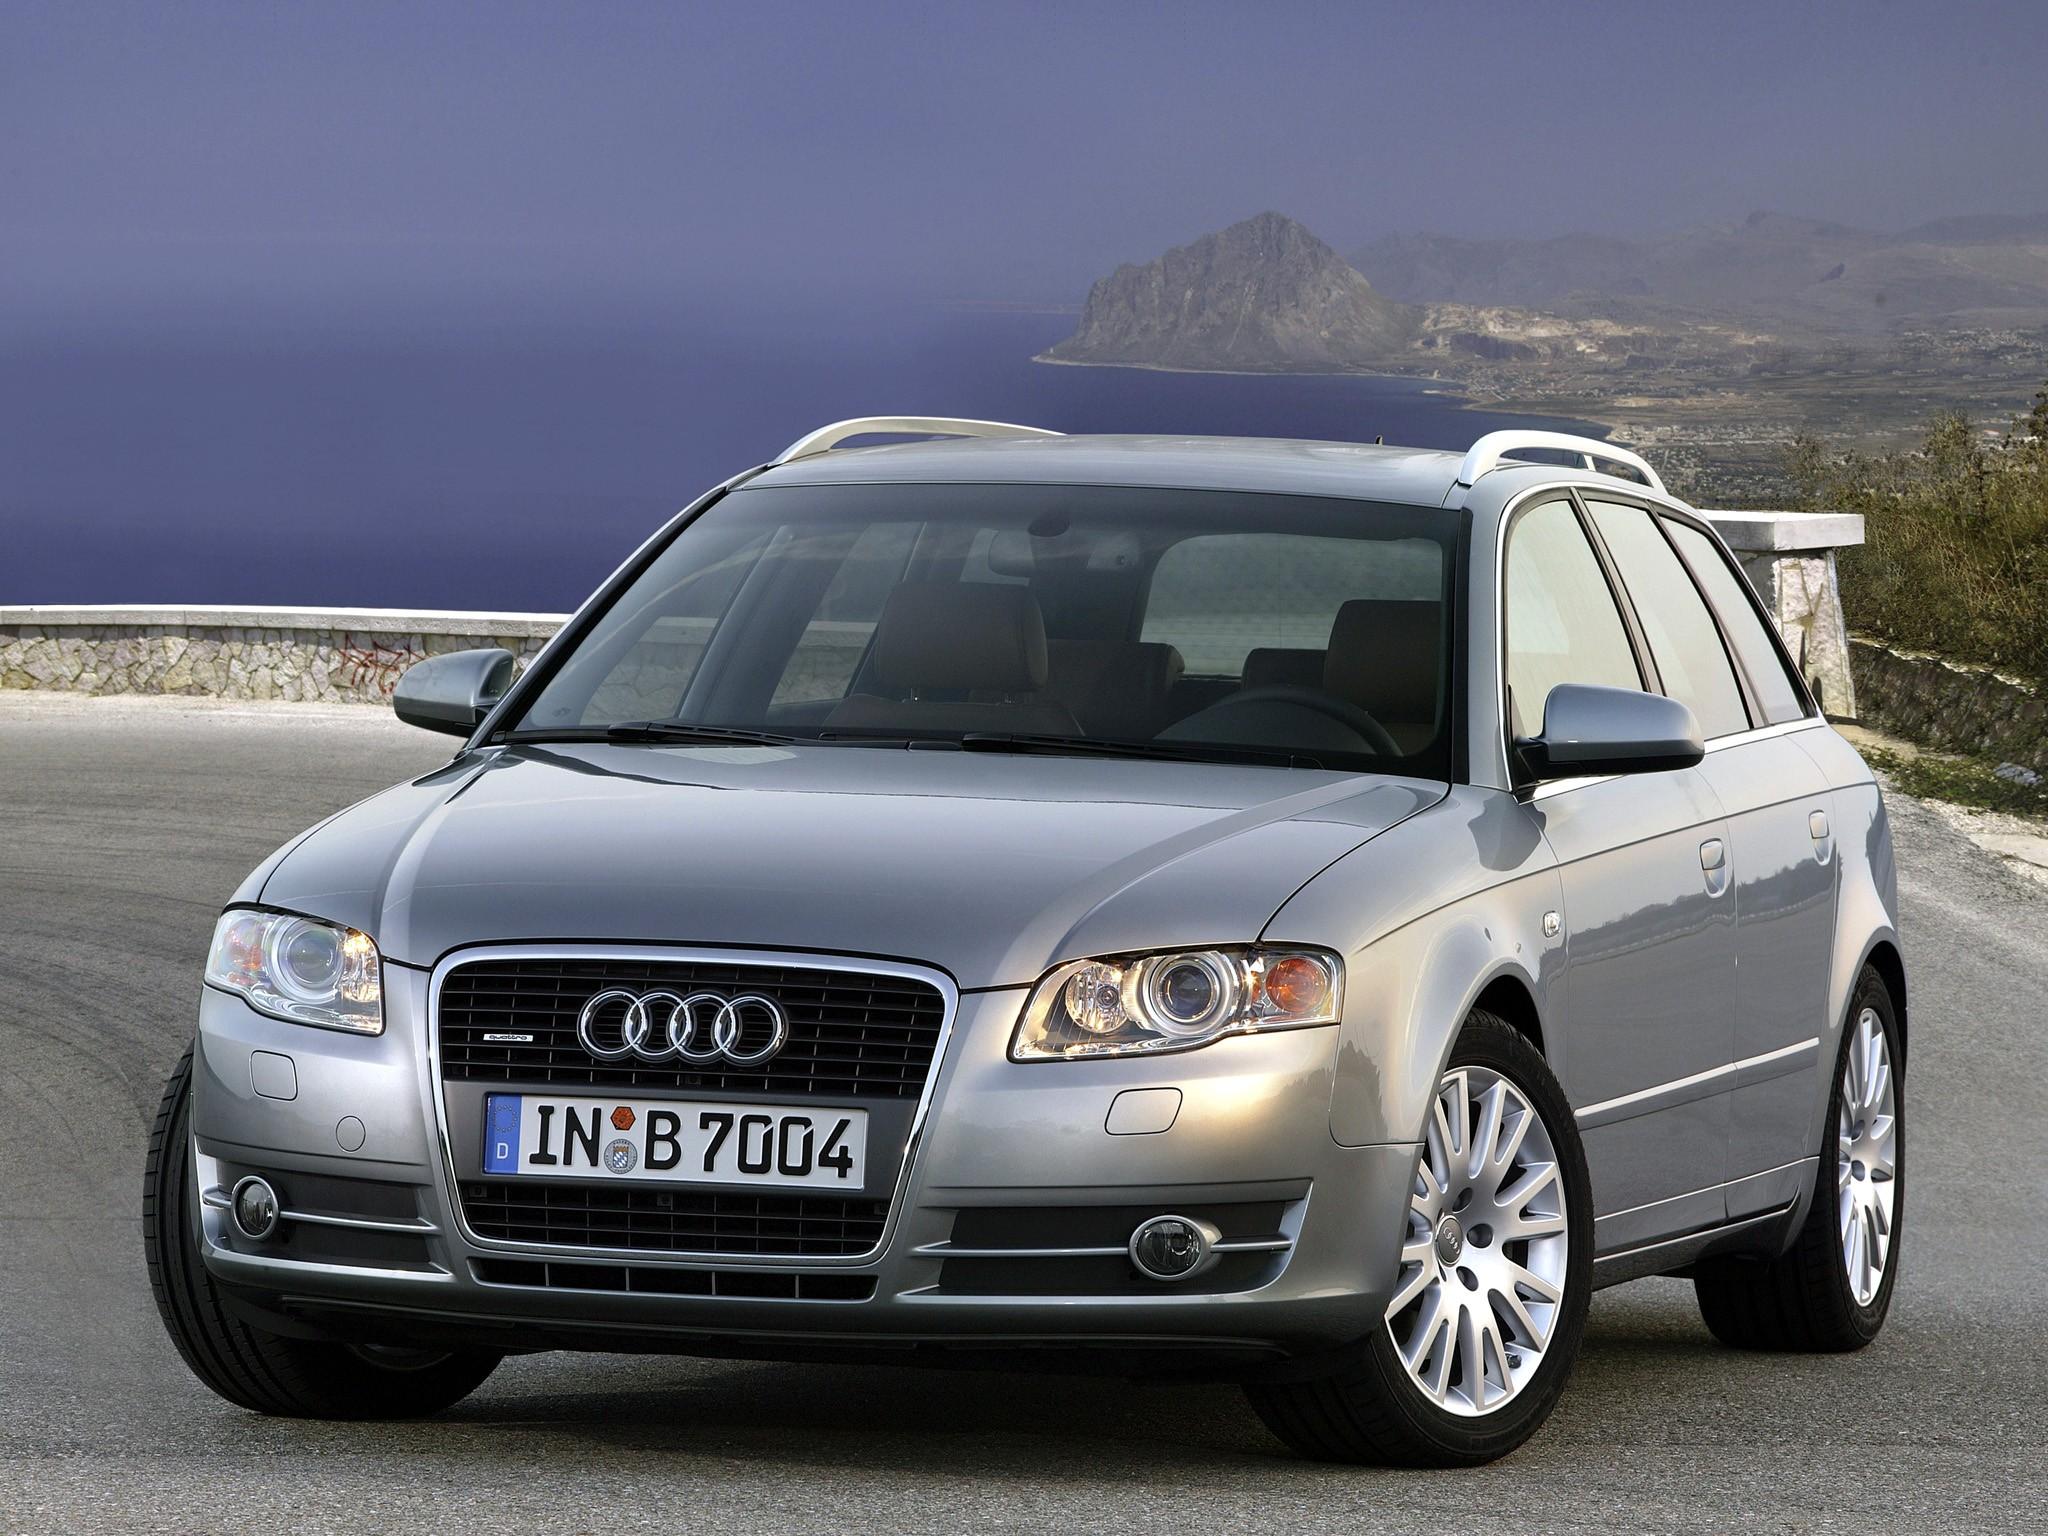 2006 Audi A4 2.0 T >> AUDI A4 Avant - 2004, 2005, 2006, 2007 - autoevolution